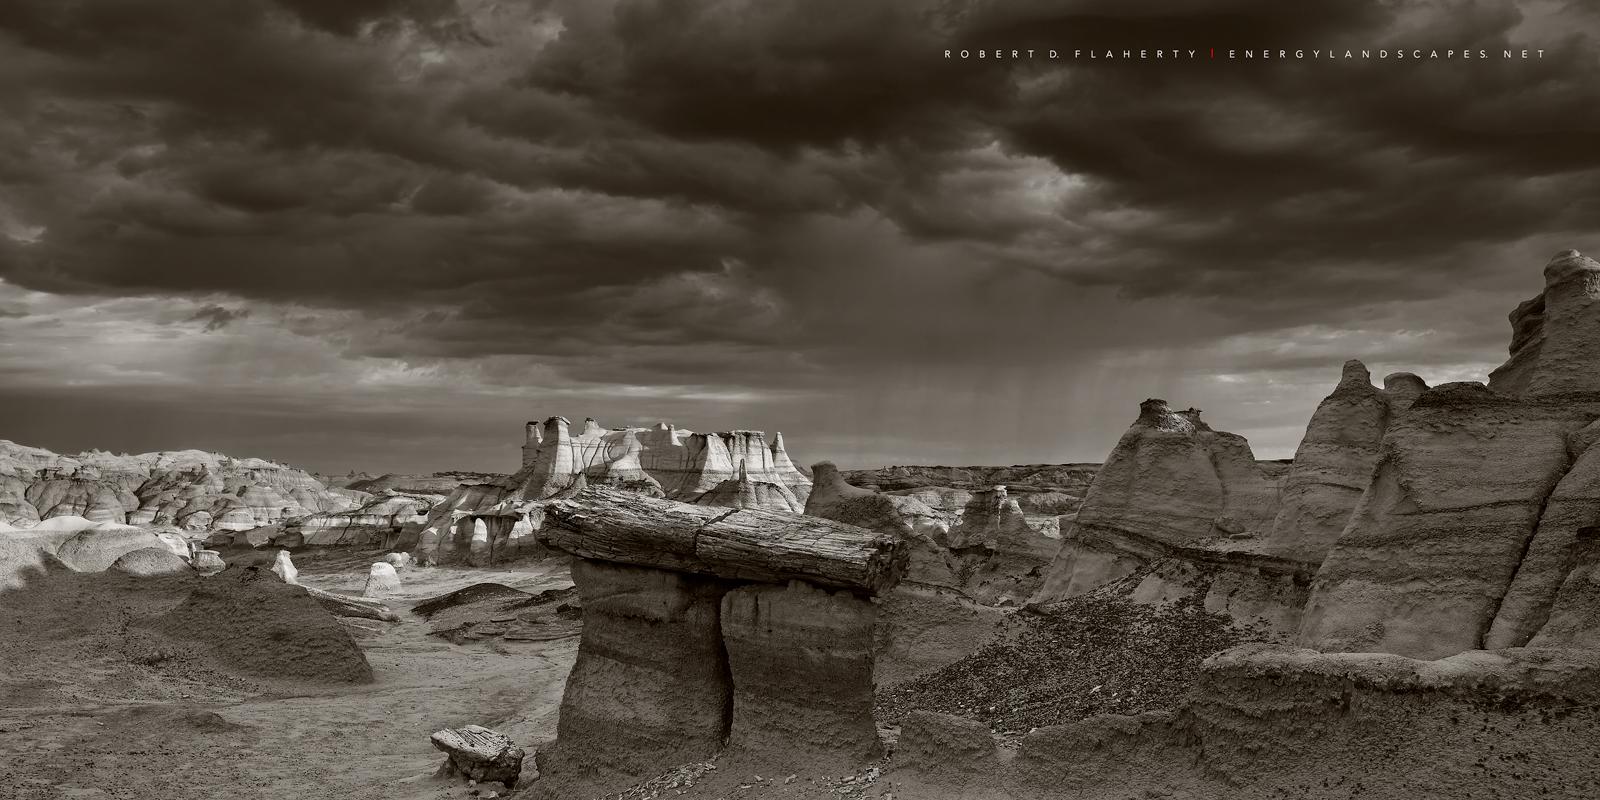 New Mexico, New Mexico fine art landscape photography, Bisti Wilderness, Navajo, desolation, monsoon, rain, Ship Rock, Northwestern New Mexico, Ruidoso, photo